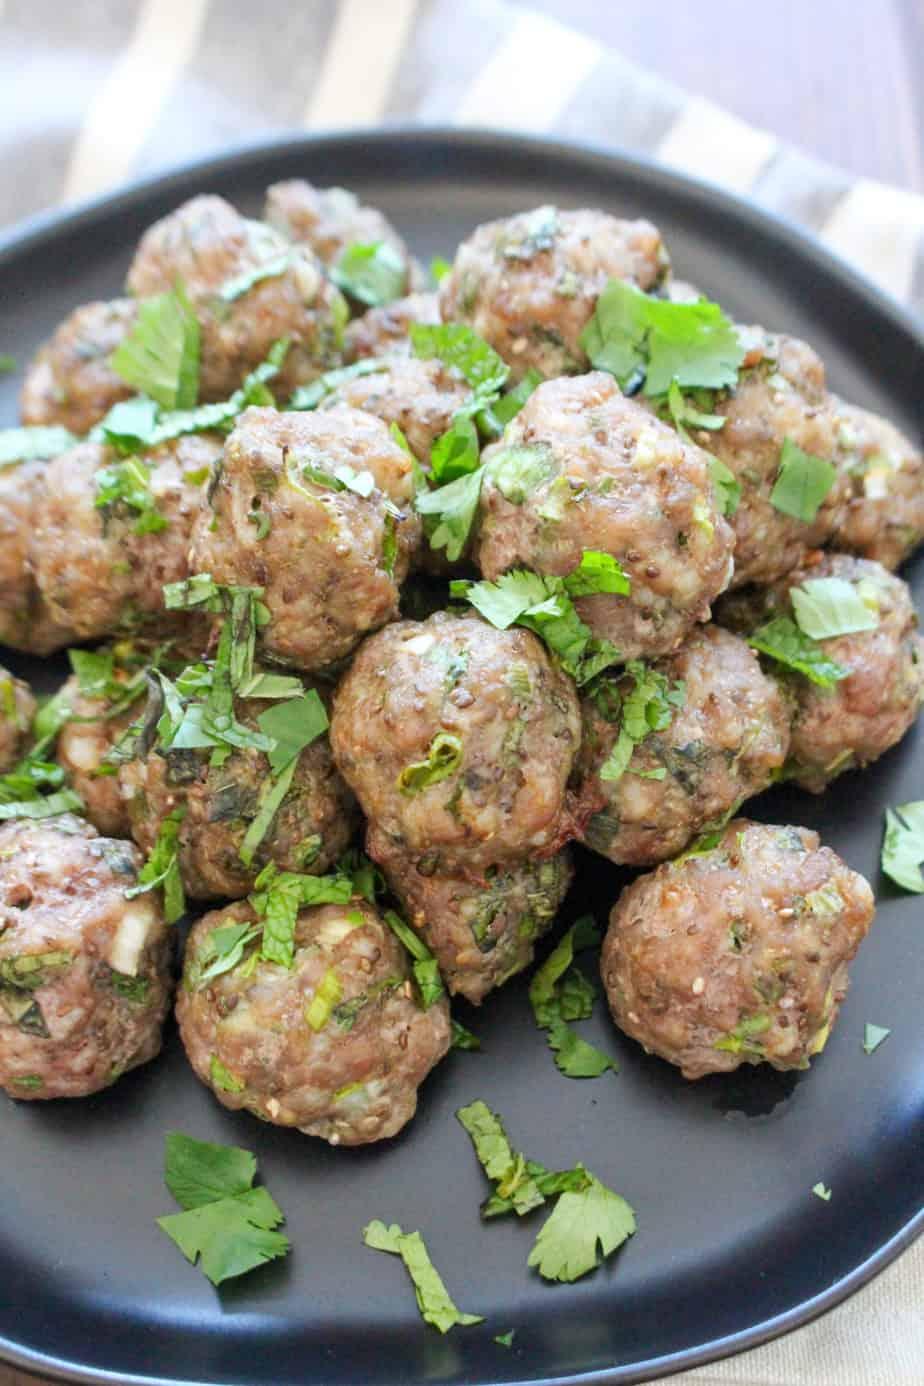 GF DF Vietnamese Bun Cha Meatballs | Frugal Nutrition #glutenfree #dairyfree #paleo #whole30 #paleomeatballs